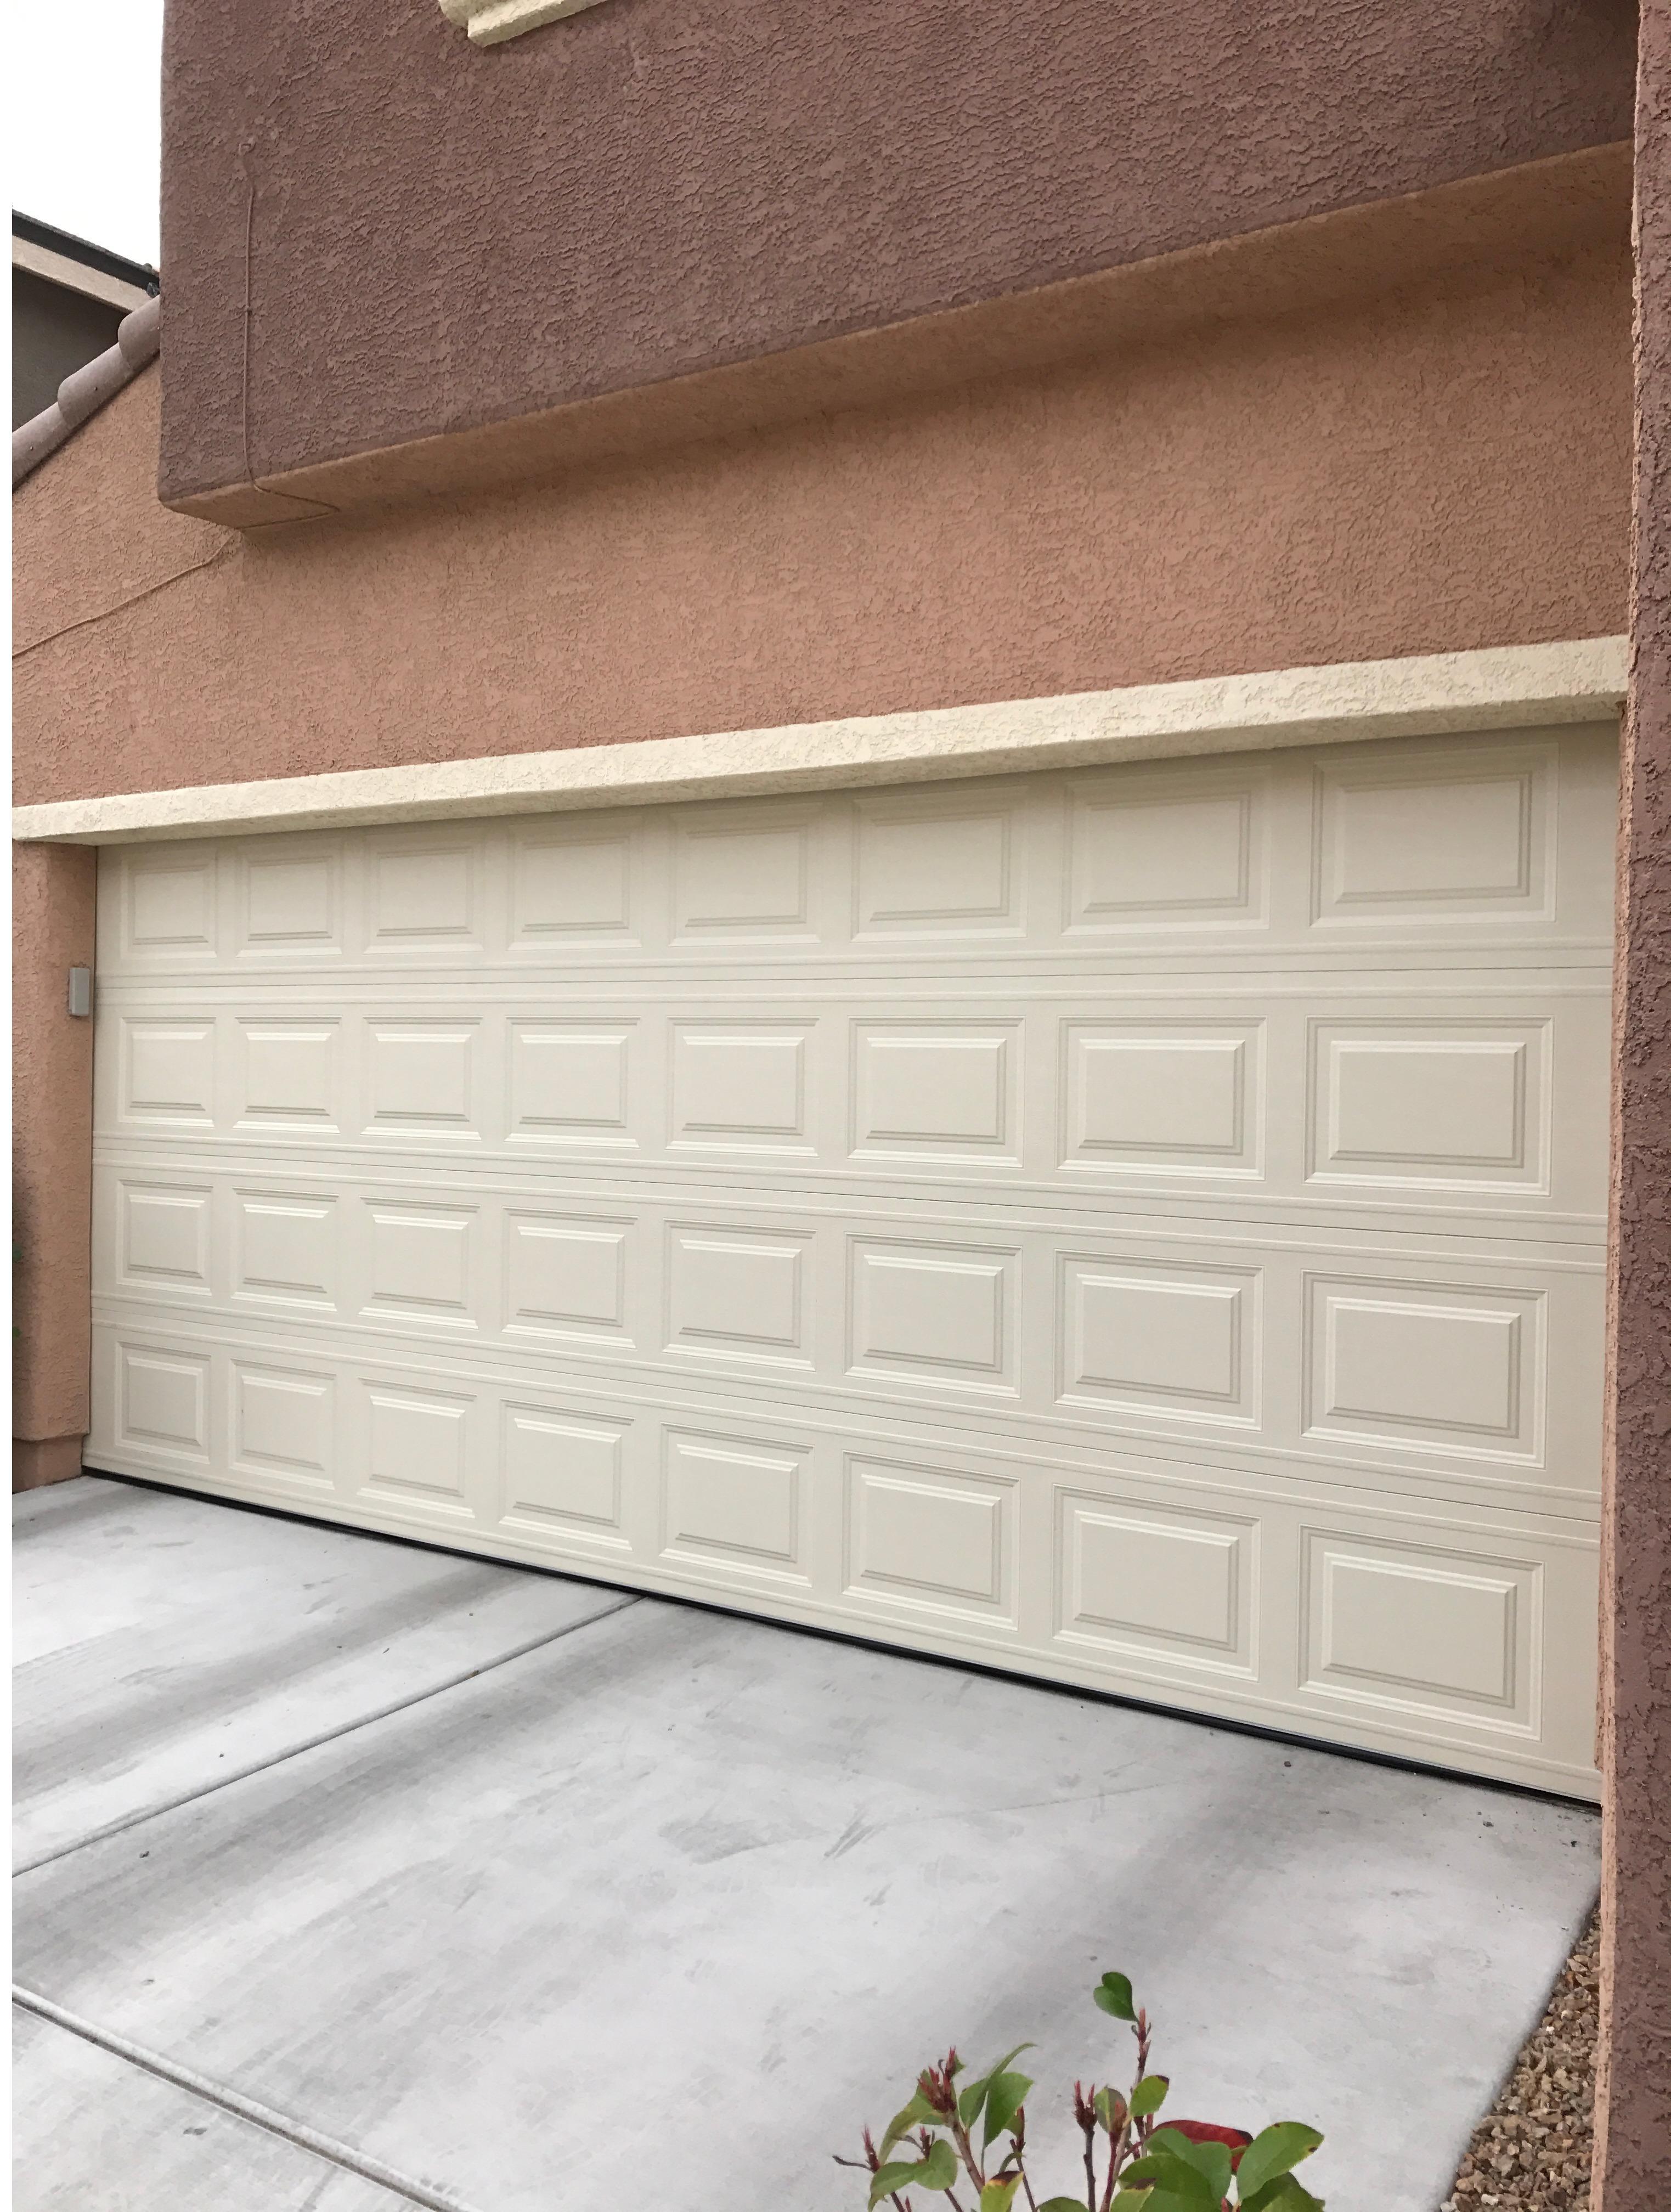 United Garage Door Columbus Ohio. Garage Door Repair Pensacola Fl Companies